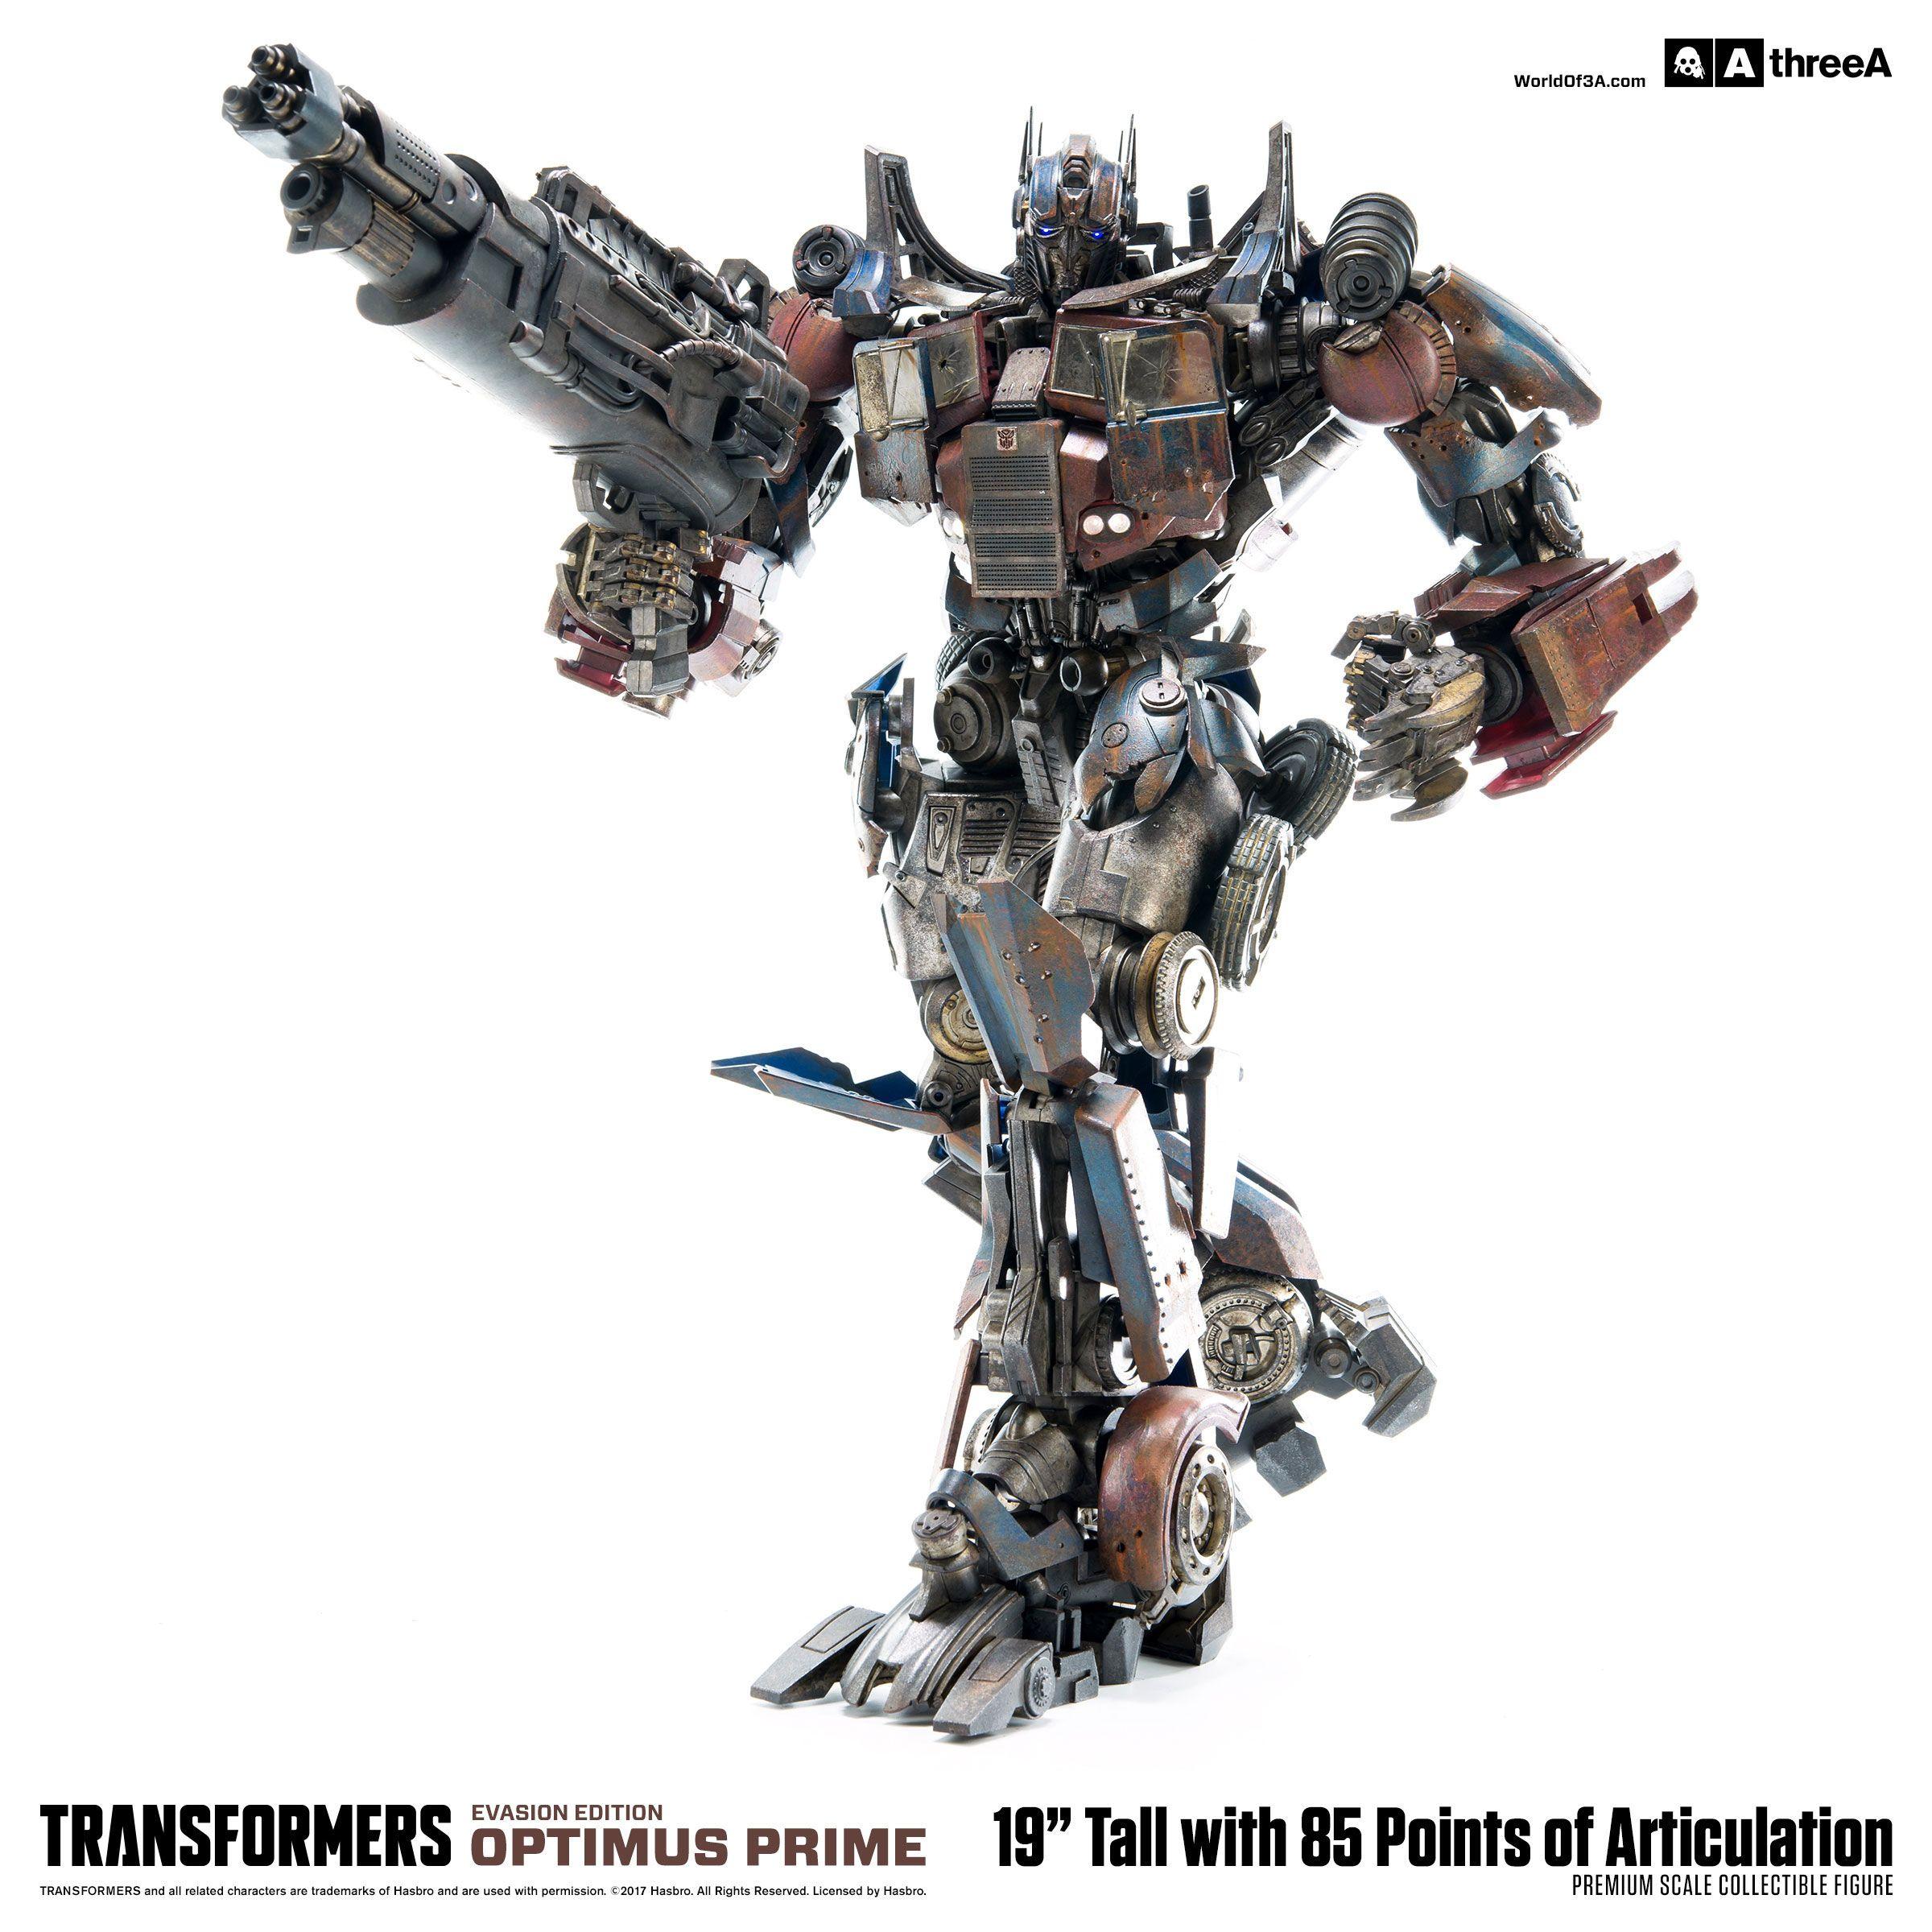 Transformers age of extinction optimus prime evasion edition premium scale action figure